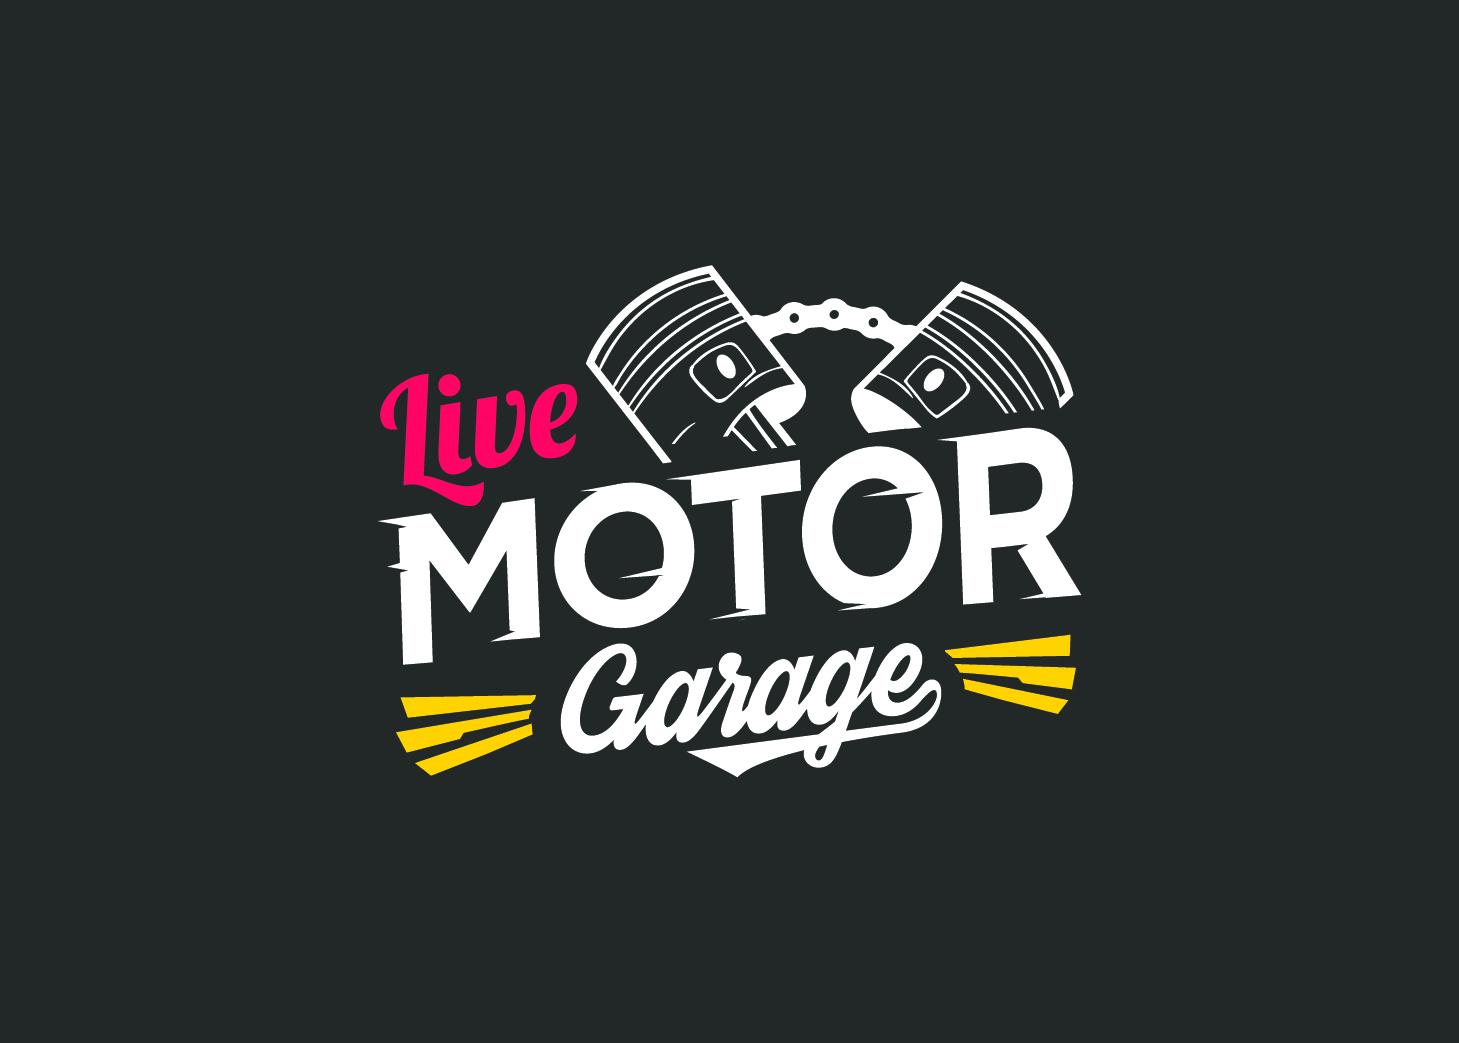 logo garage y motor